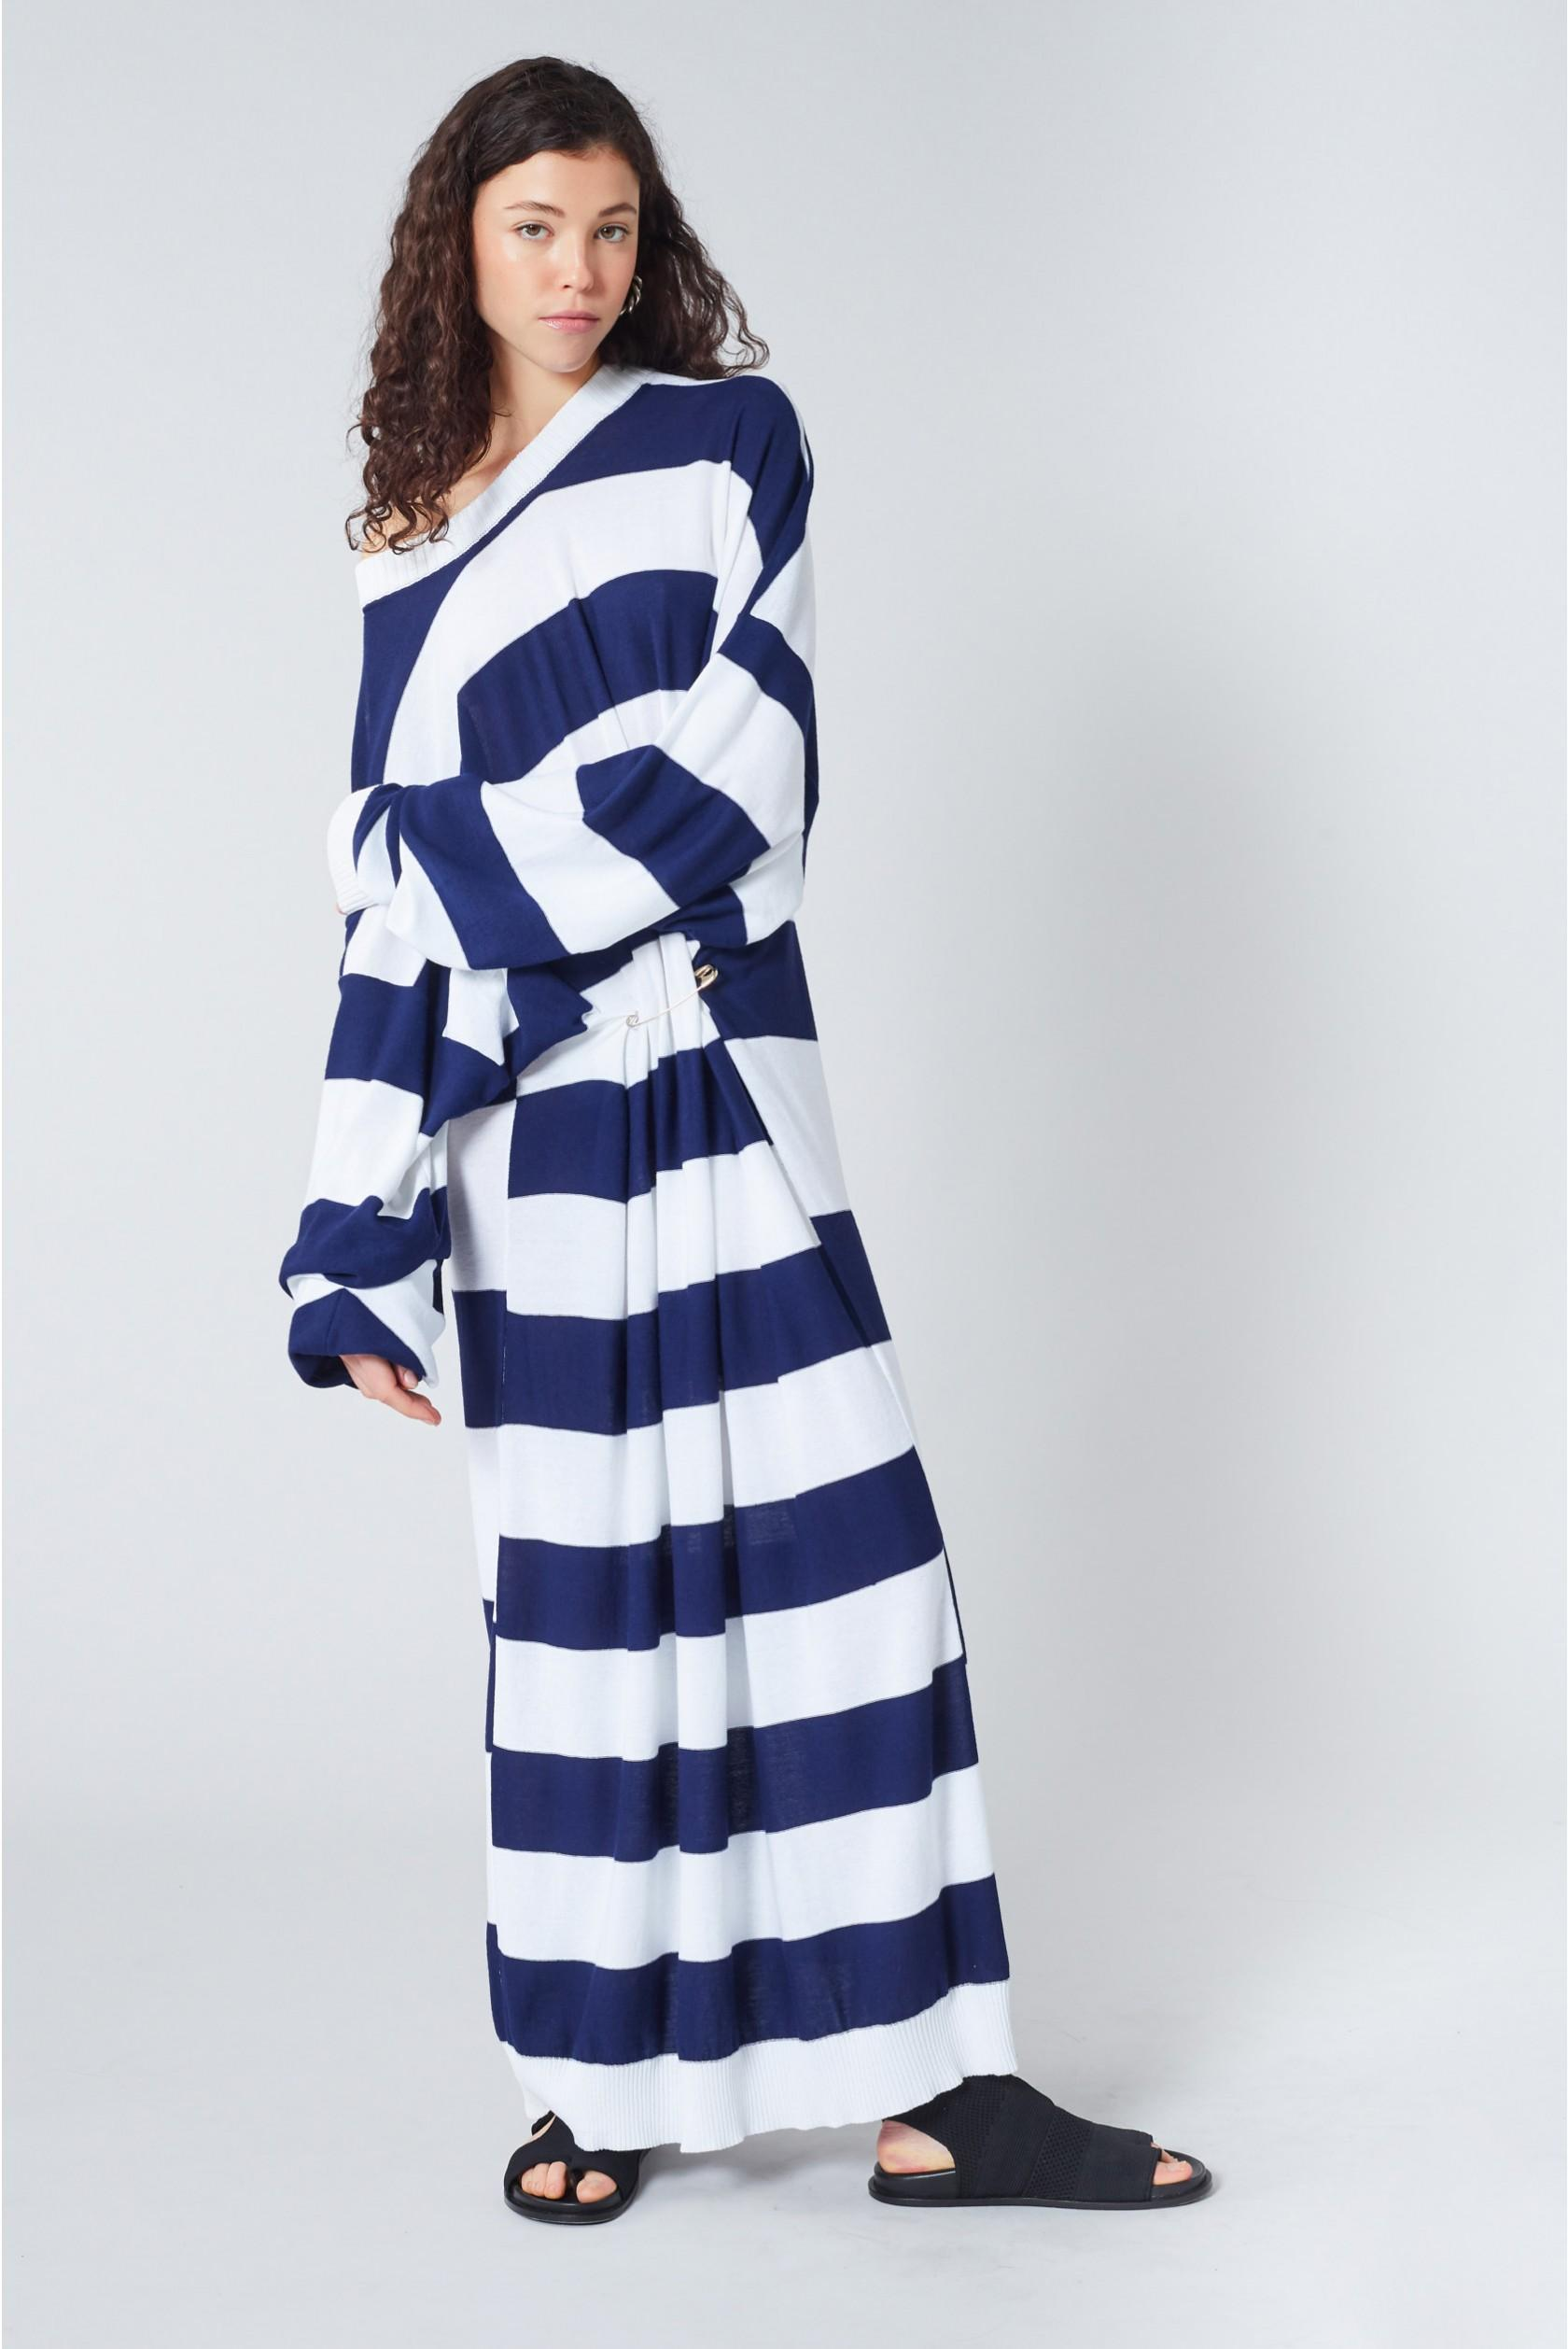 9255fc5ec30 Sonia Rykiel. Women's Blue Striped Knit Maxi Dress. $1,390 From Orchard Mile